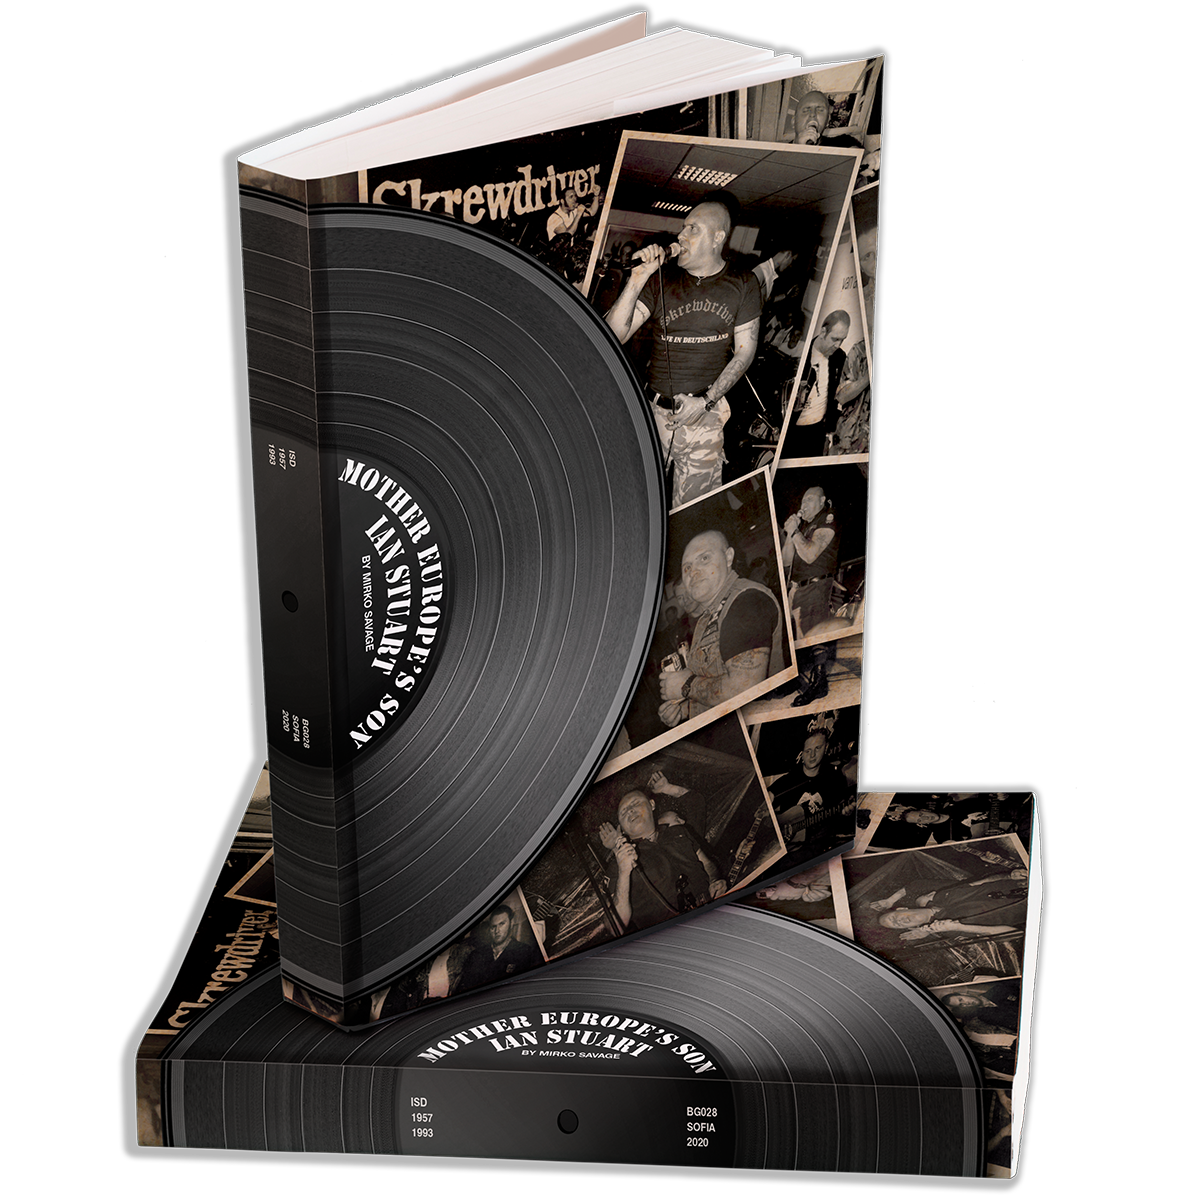 Revolt NS: New Book on Ian Stuart and Skrewdriver